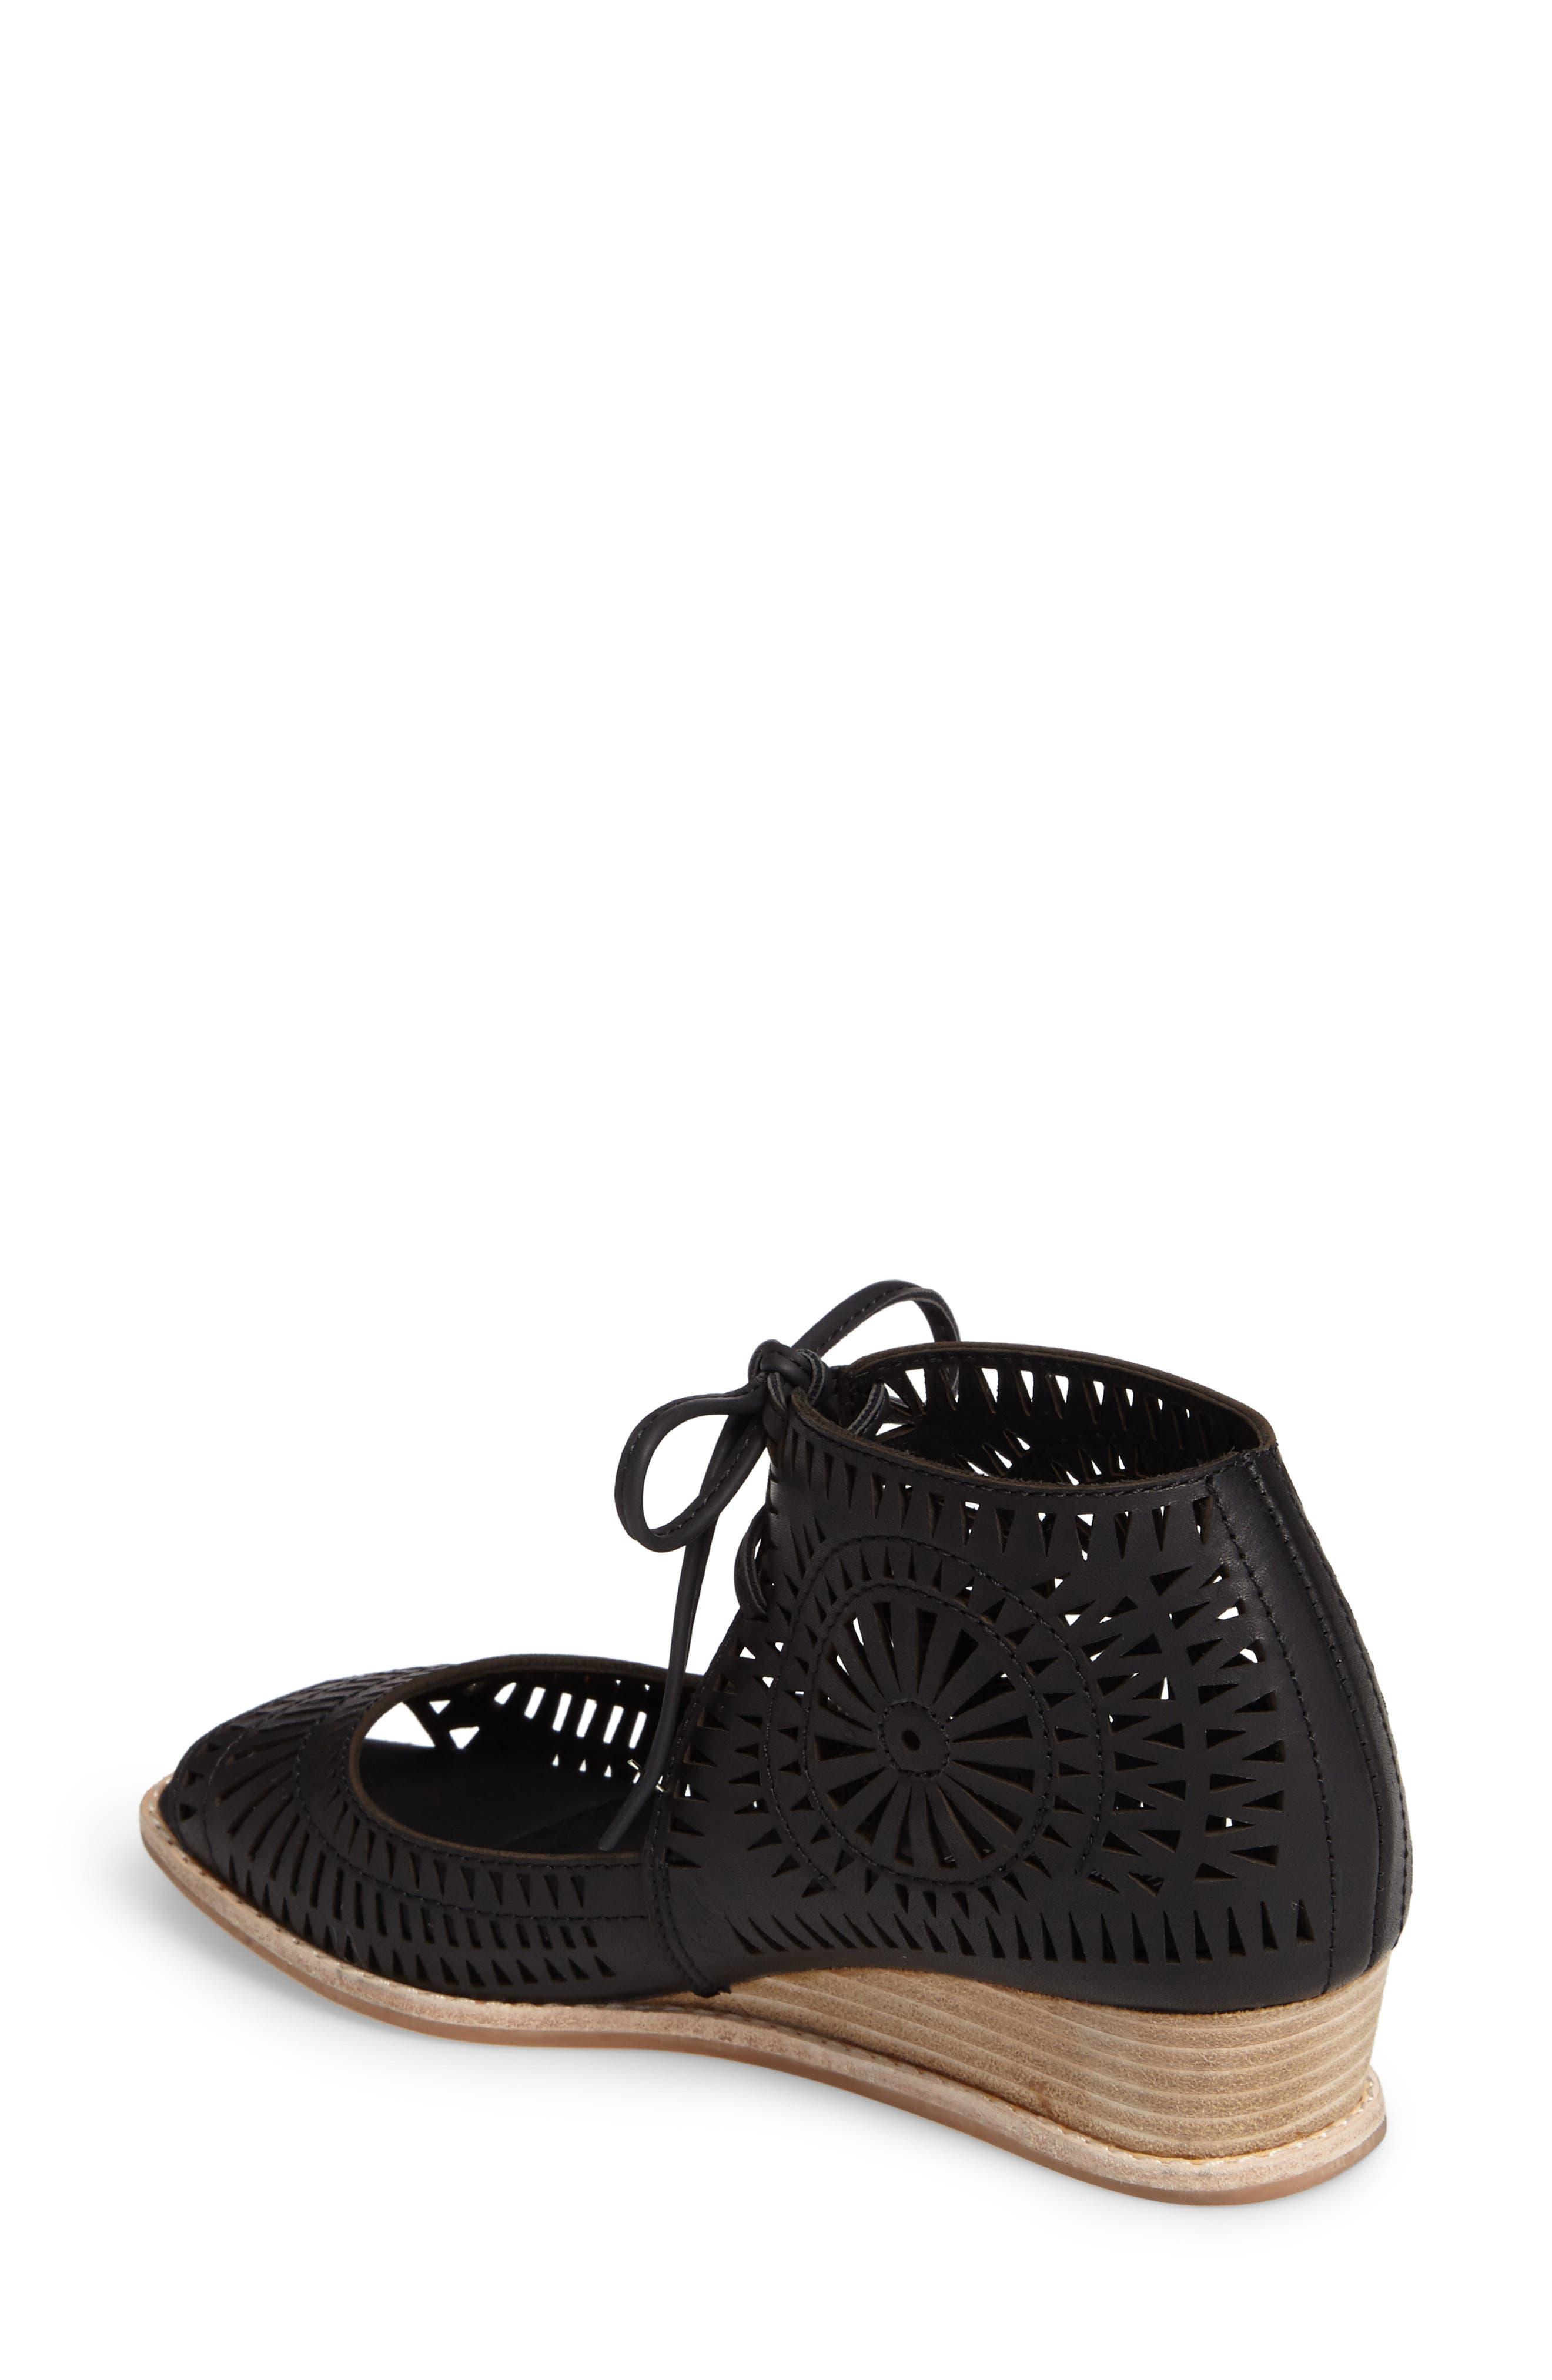 Rayos Perforated Wedge Sandal,                             Alternate thumbnail 2, color,                             001